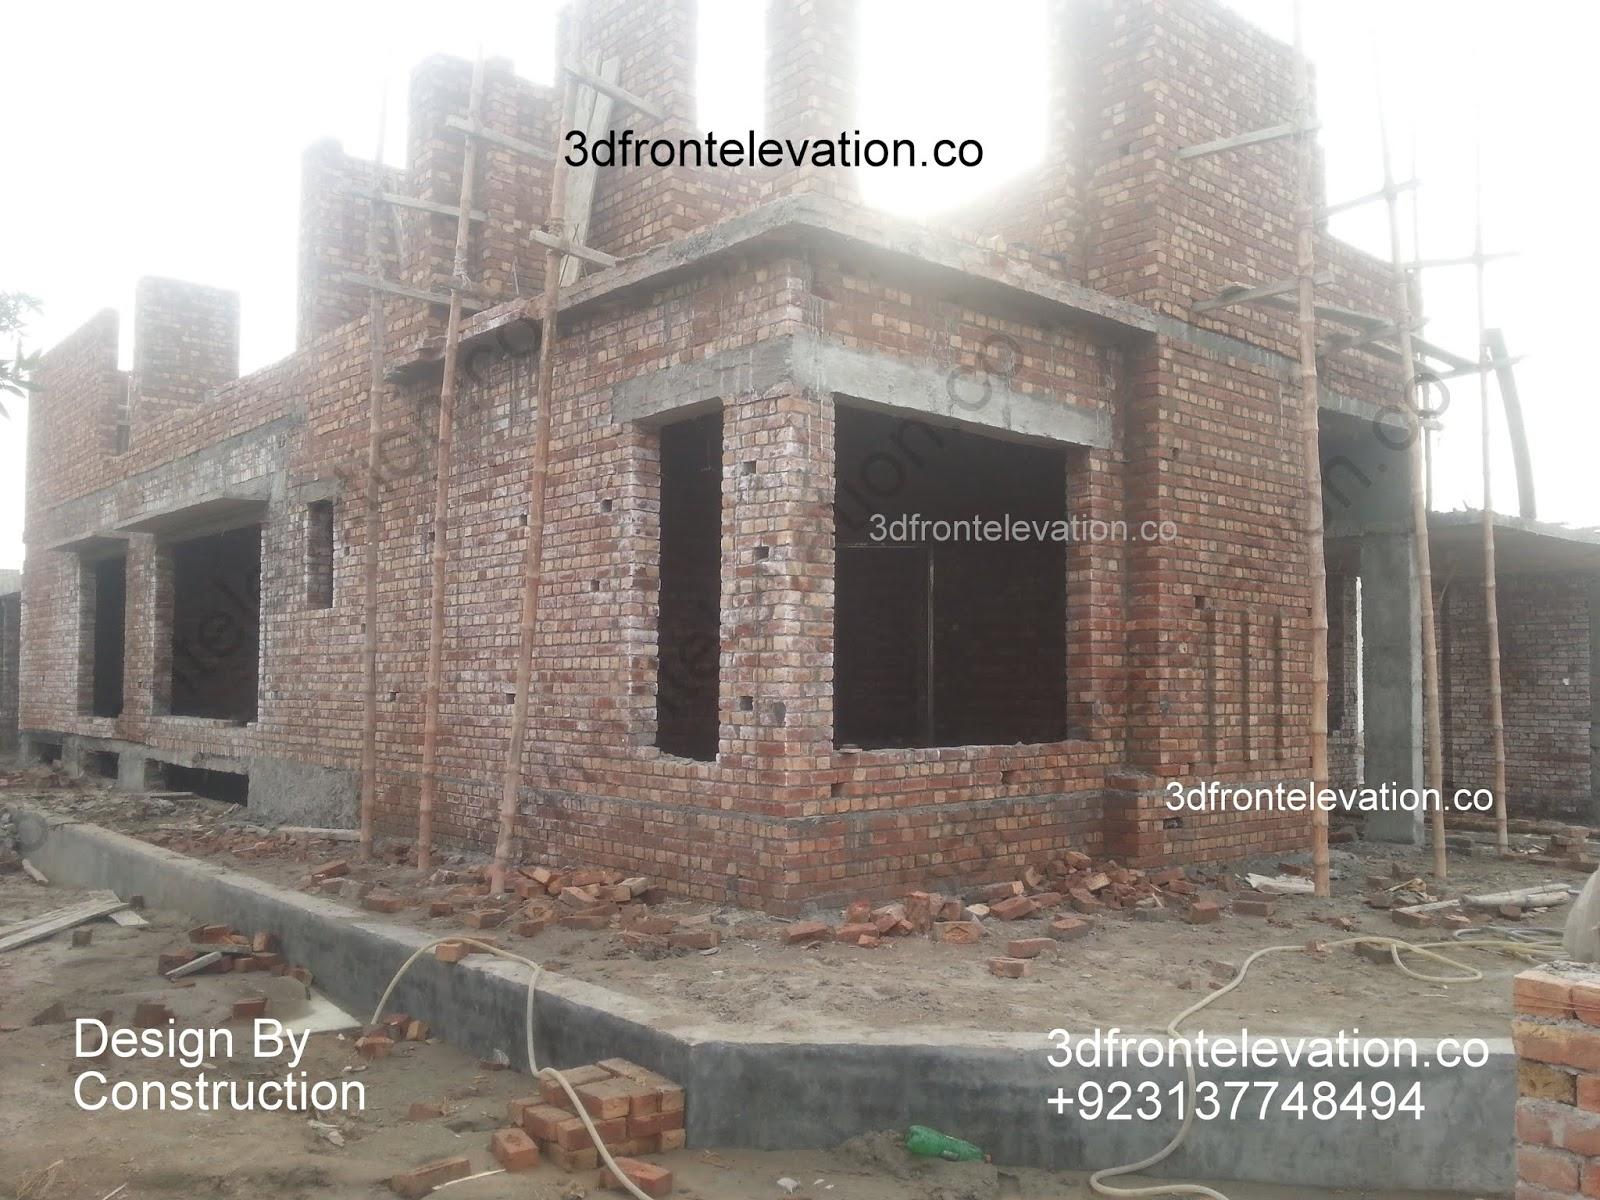 1 Kanal Corner House Bahria Town Construction, Architectural , Interiors Design Services